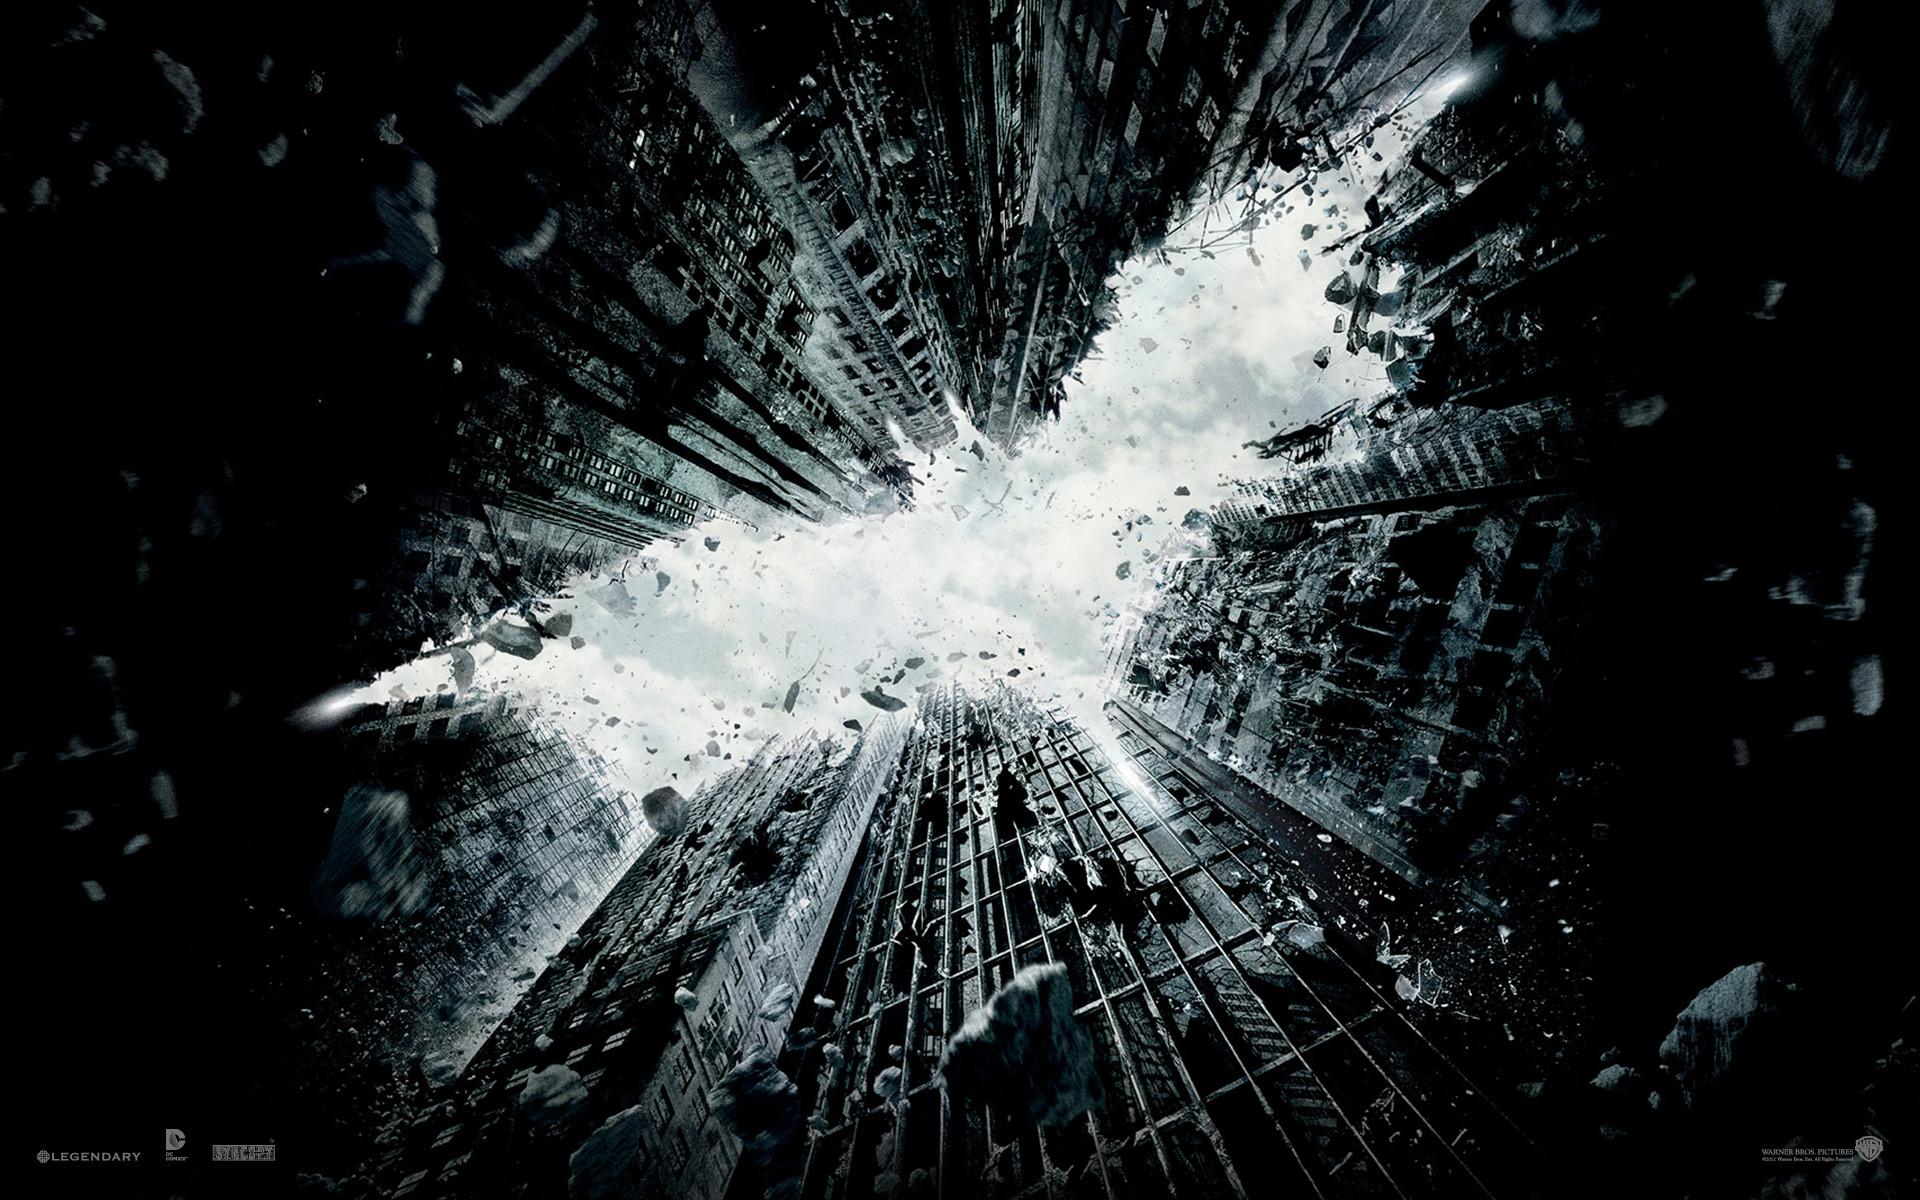 'The Dark Knight Rises' Wallpapers: Decorate Your Desktop, Batman Style